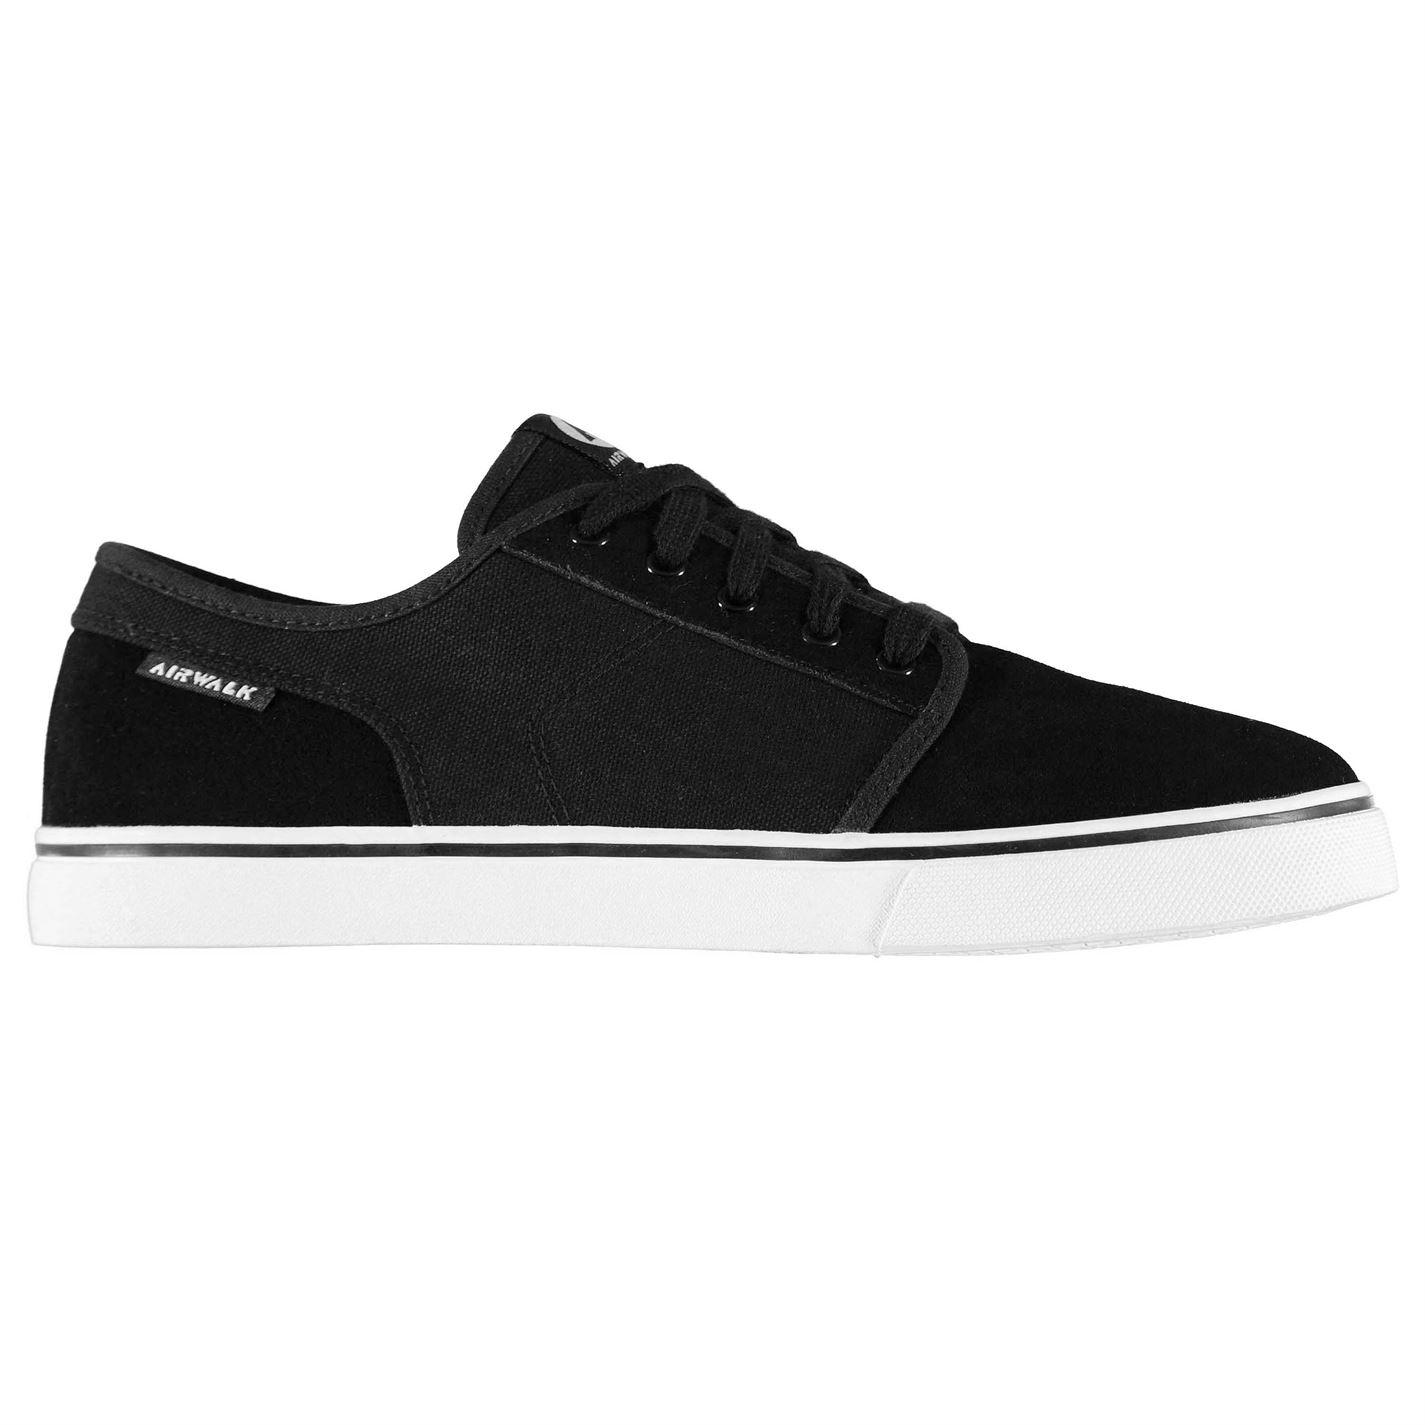 boty Airwalk Tempo2 Shoe Sn83